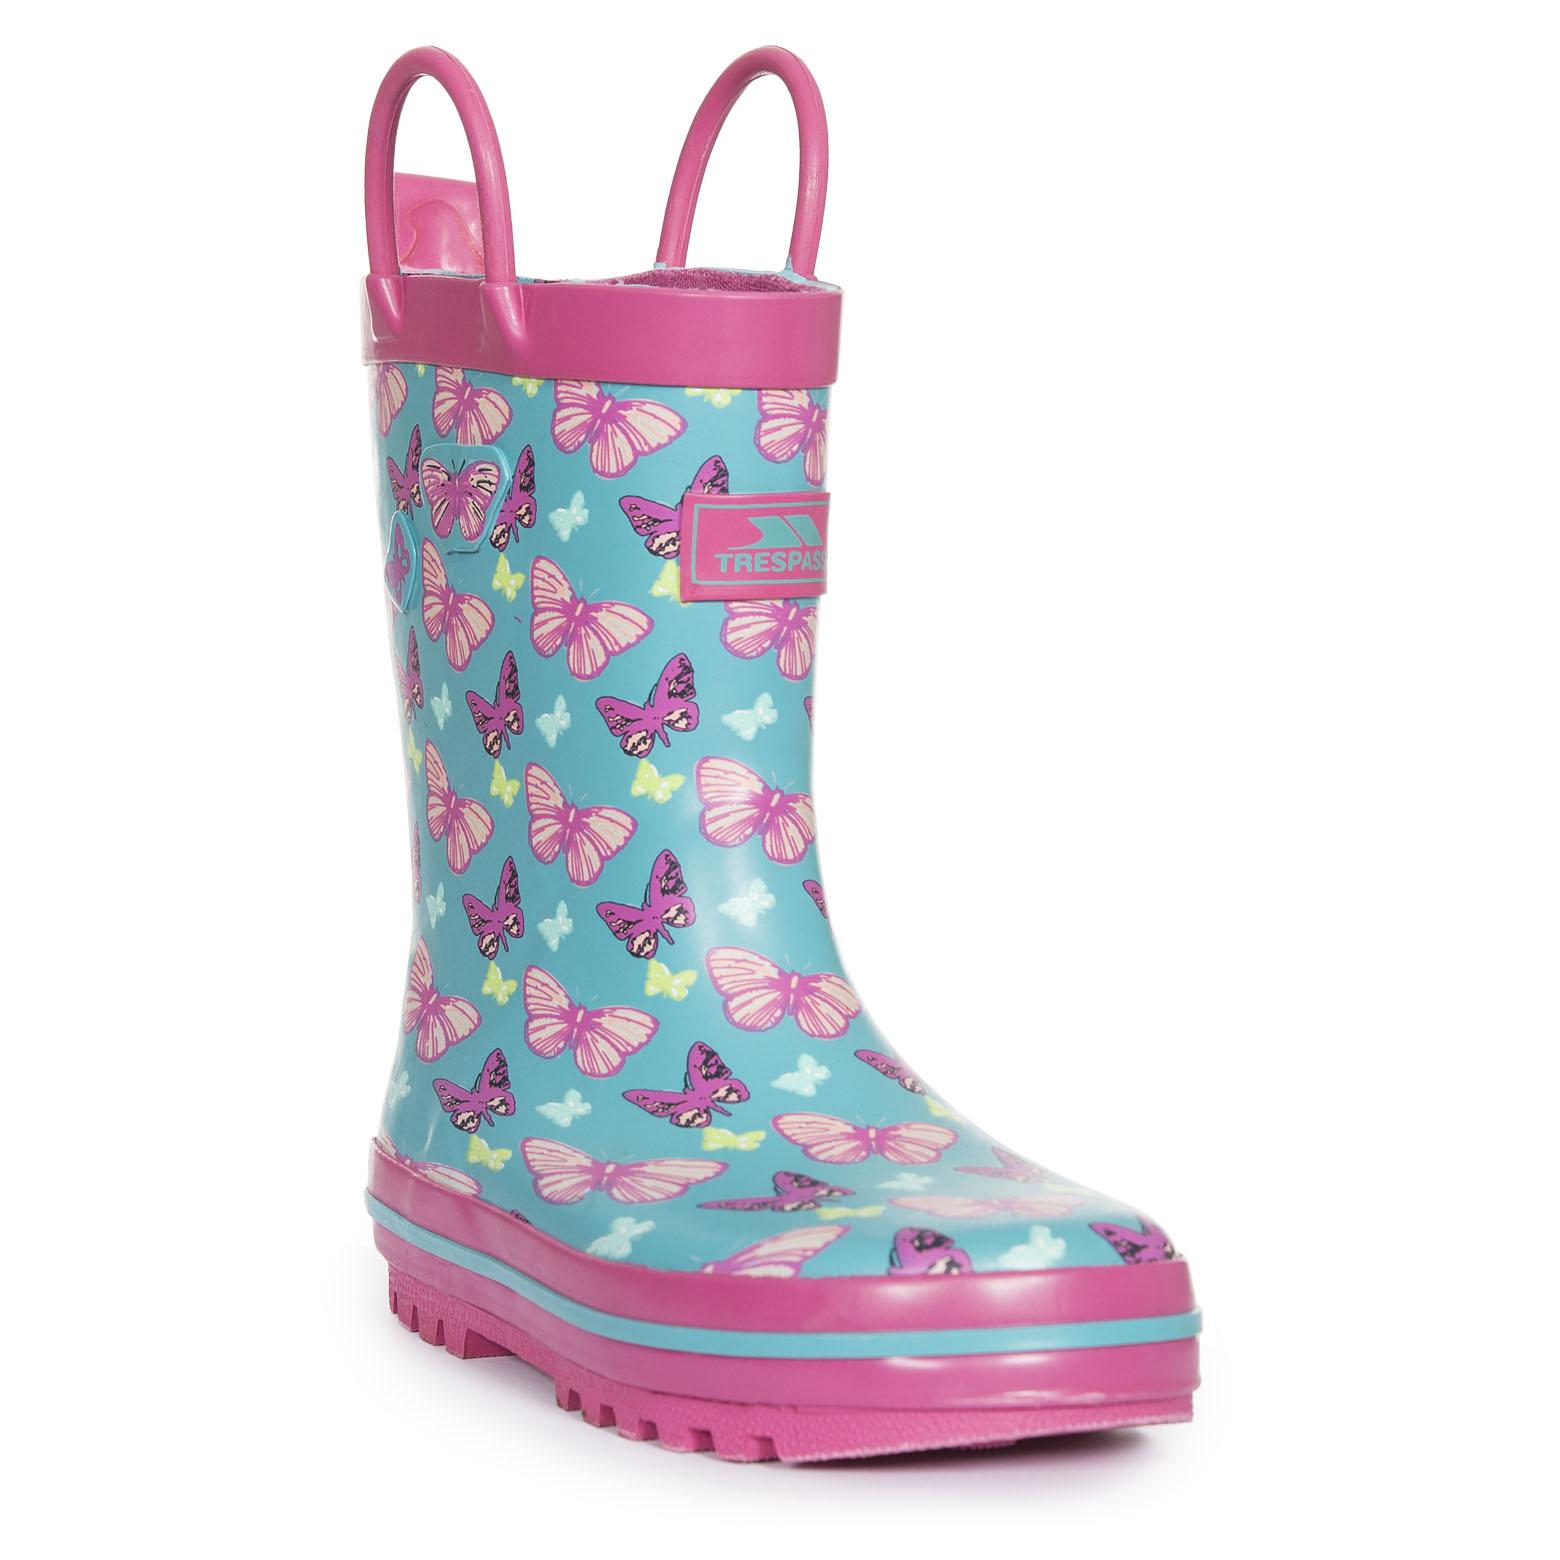 Trespass Butterflie Chicas Wellington Impermeable Botas De Agua Botas de caucho para lluvia niños